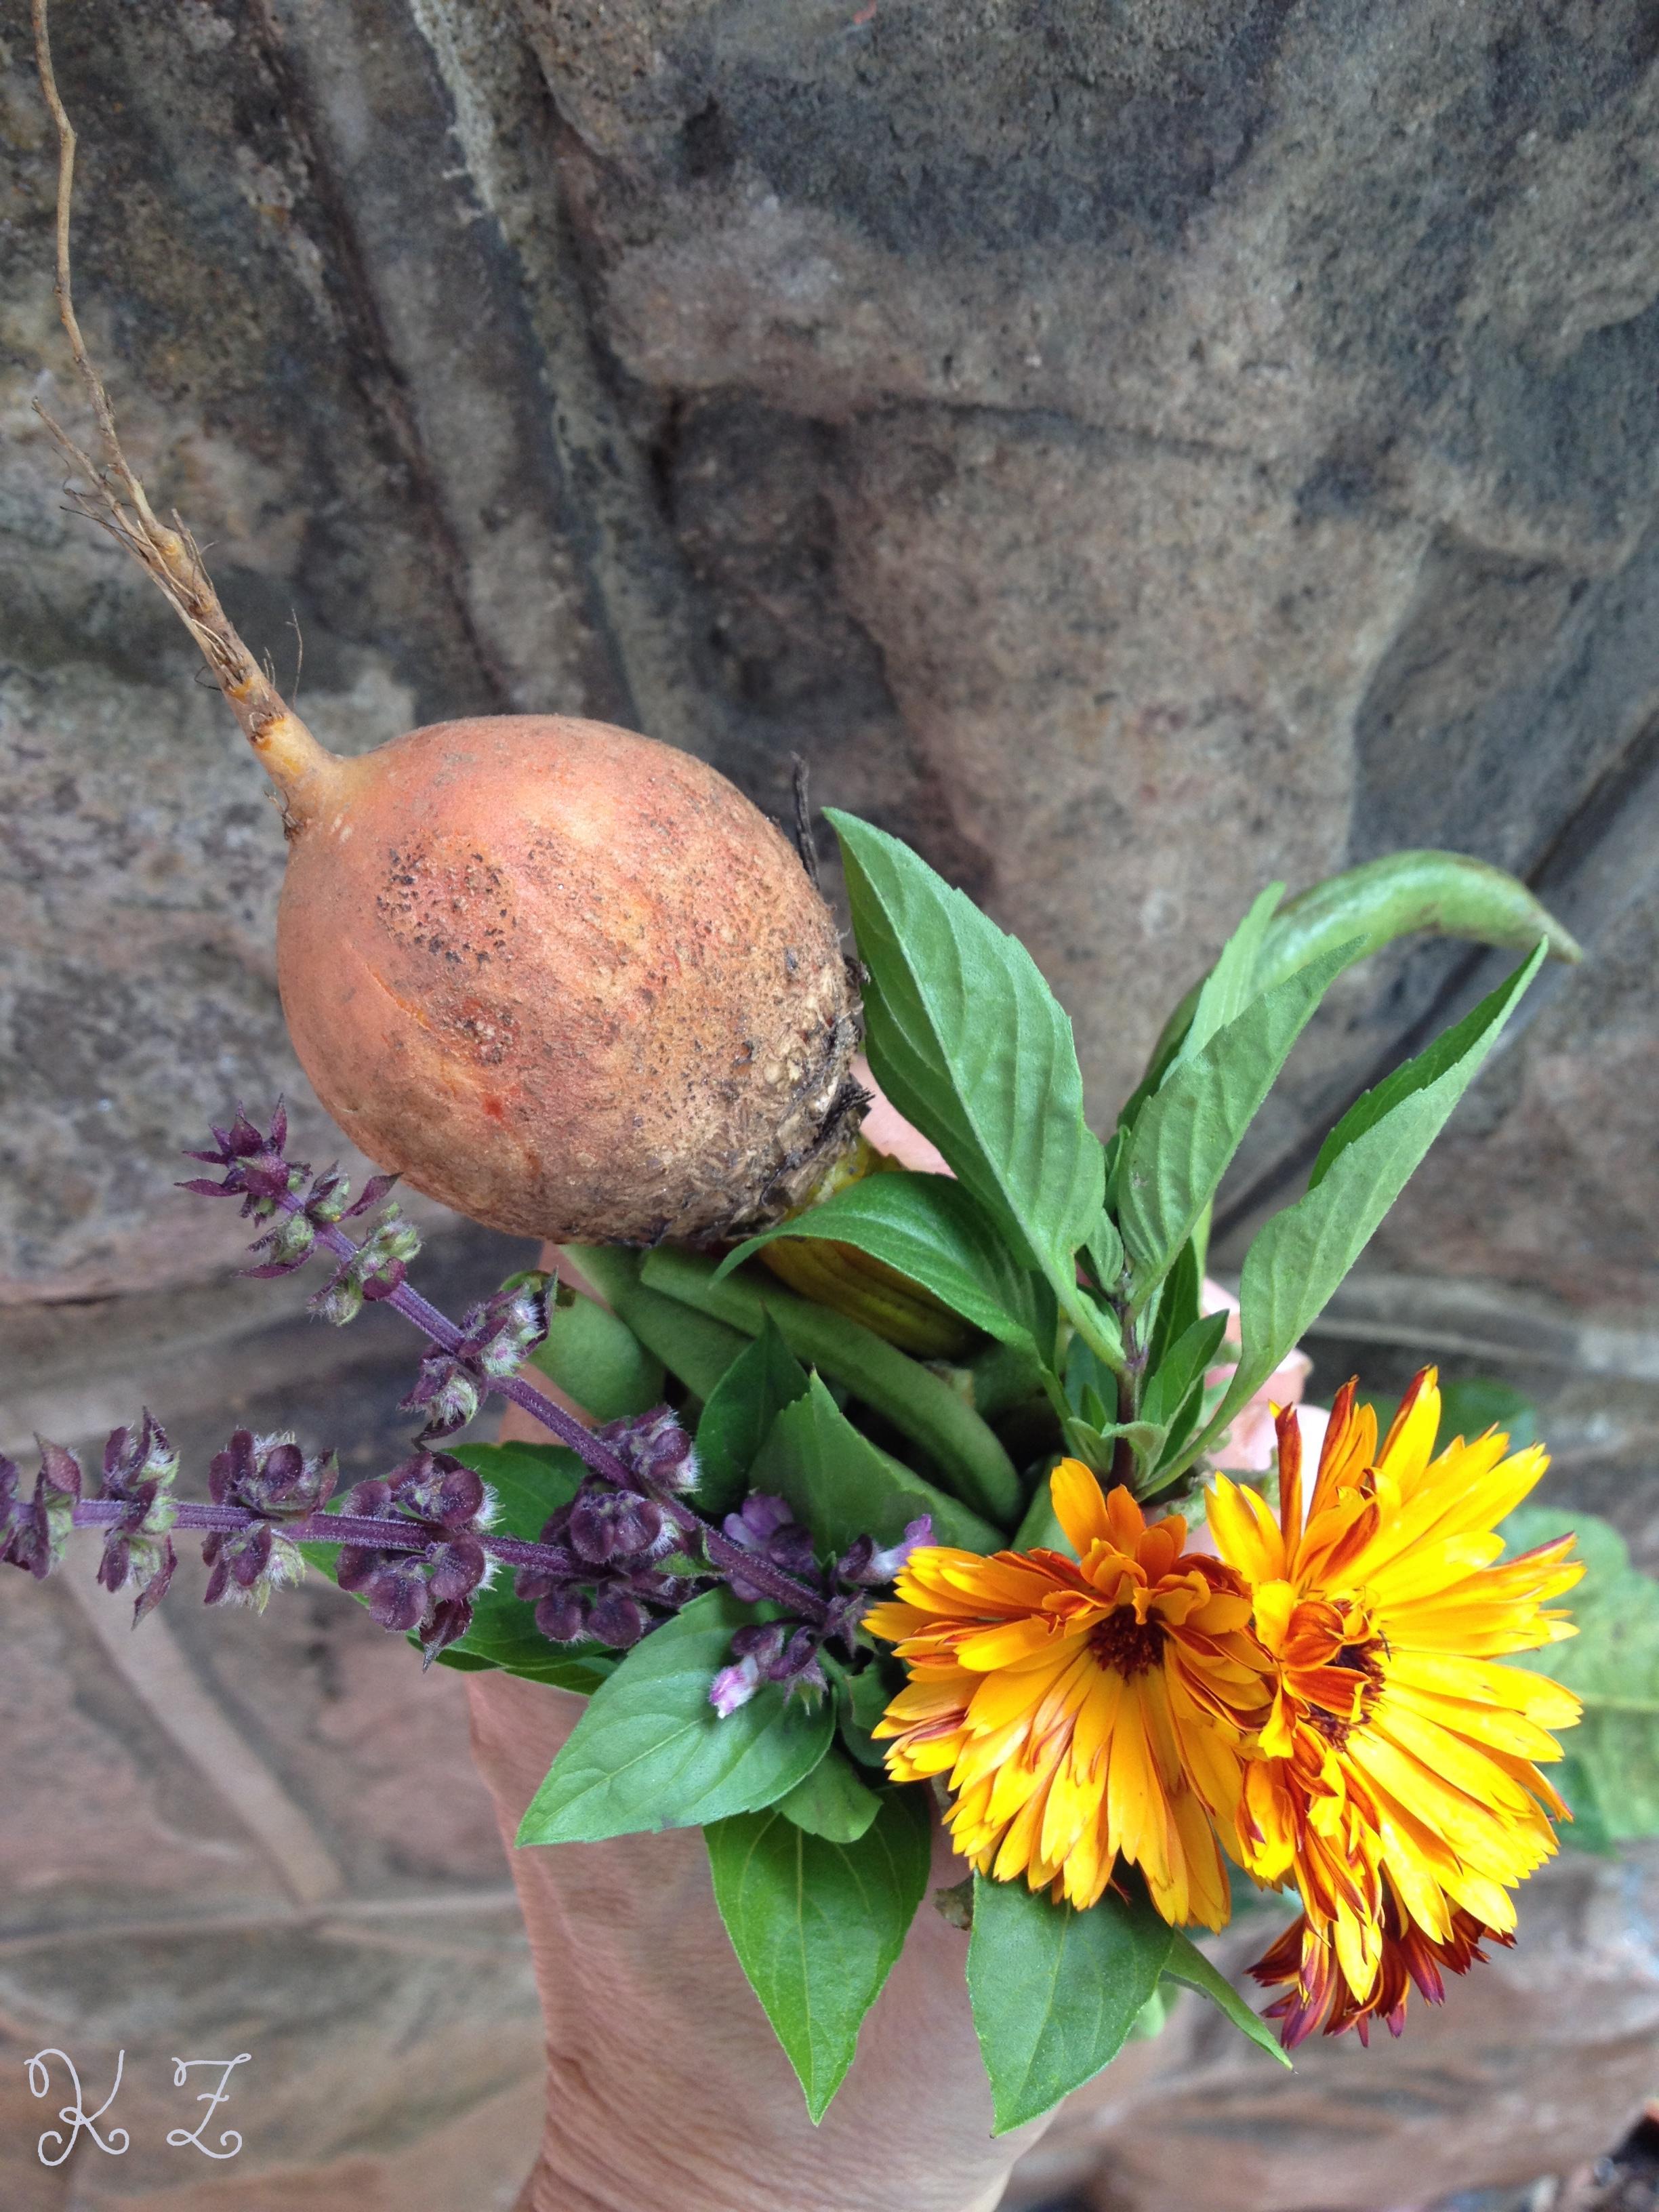 Golden beet, Thai basil & Calendula